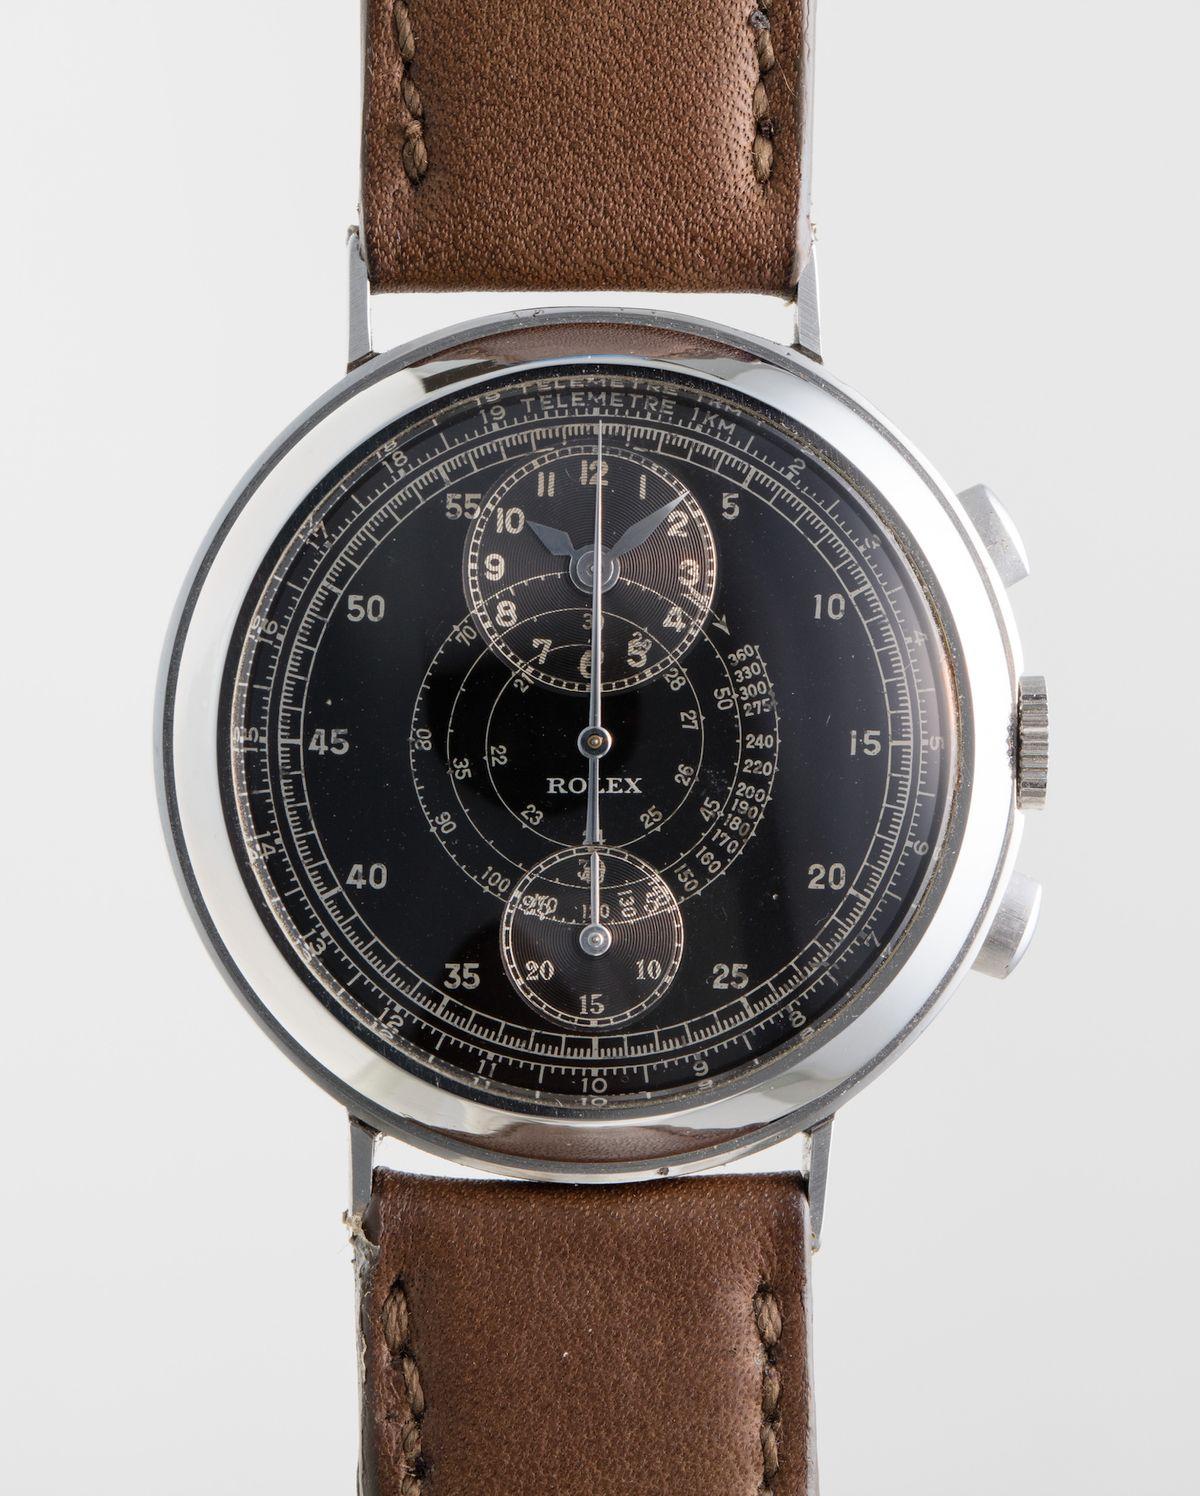 The strangest and rarest rolex watches 2737 Regulator Chronograph